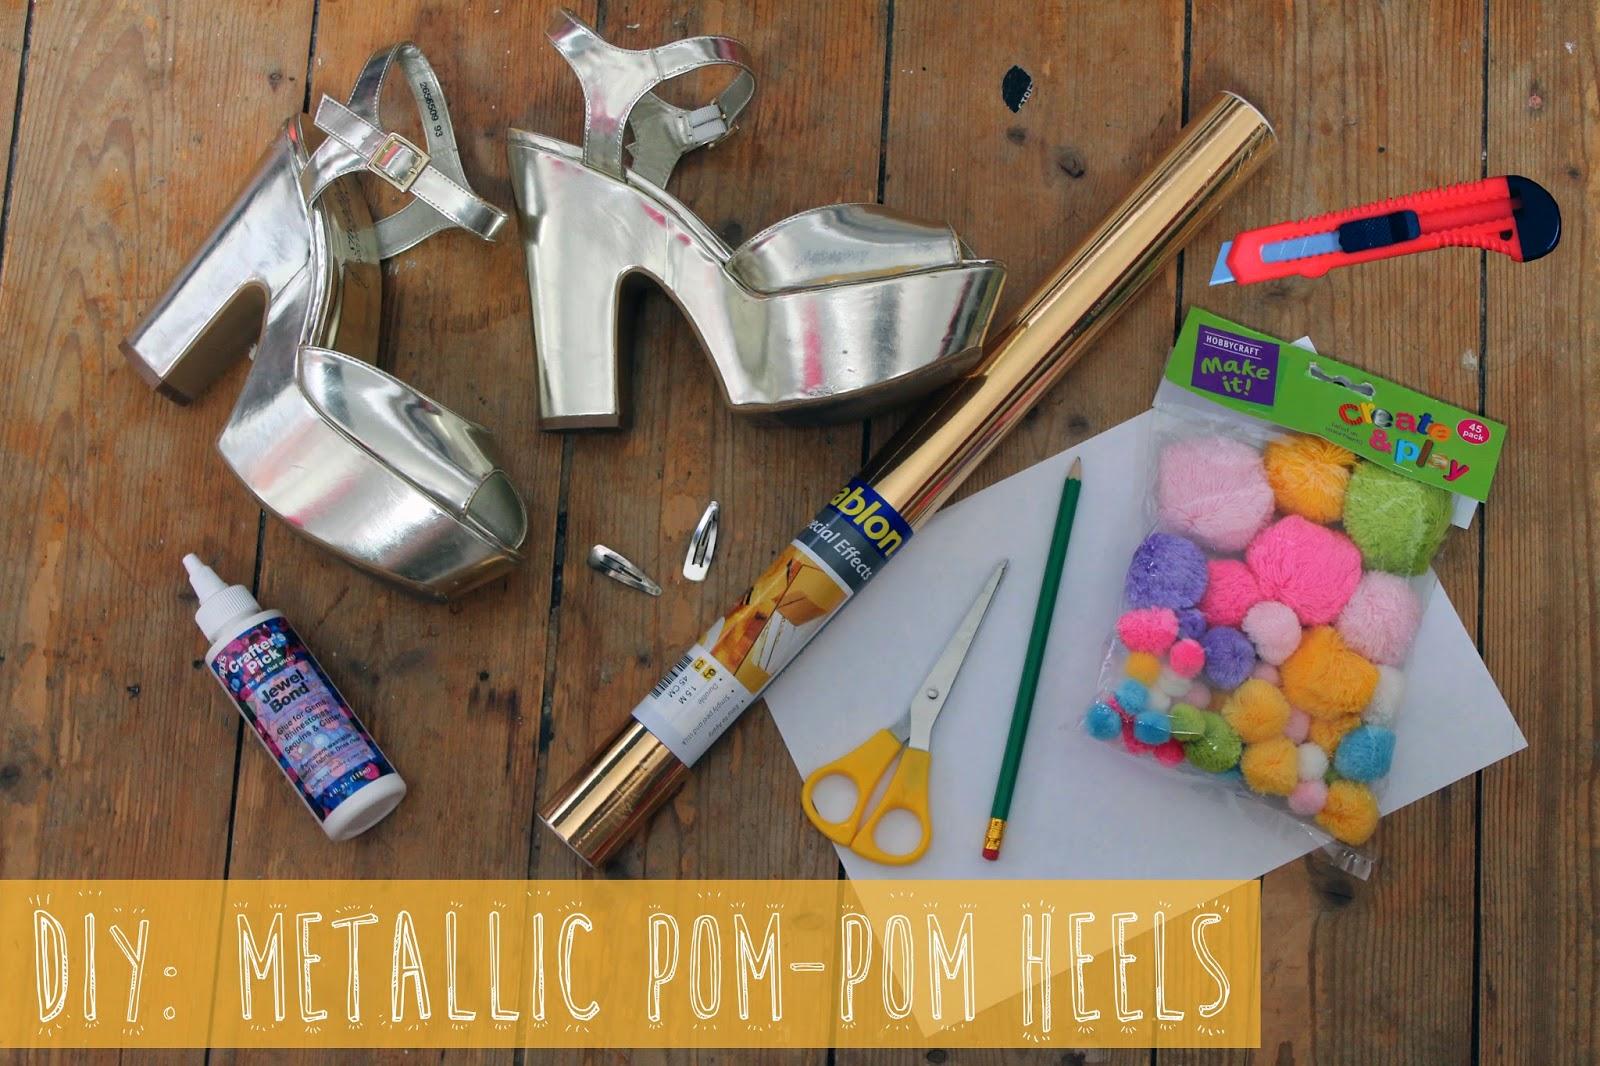 DIY metallic pom-pom heels tutorial